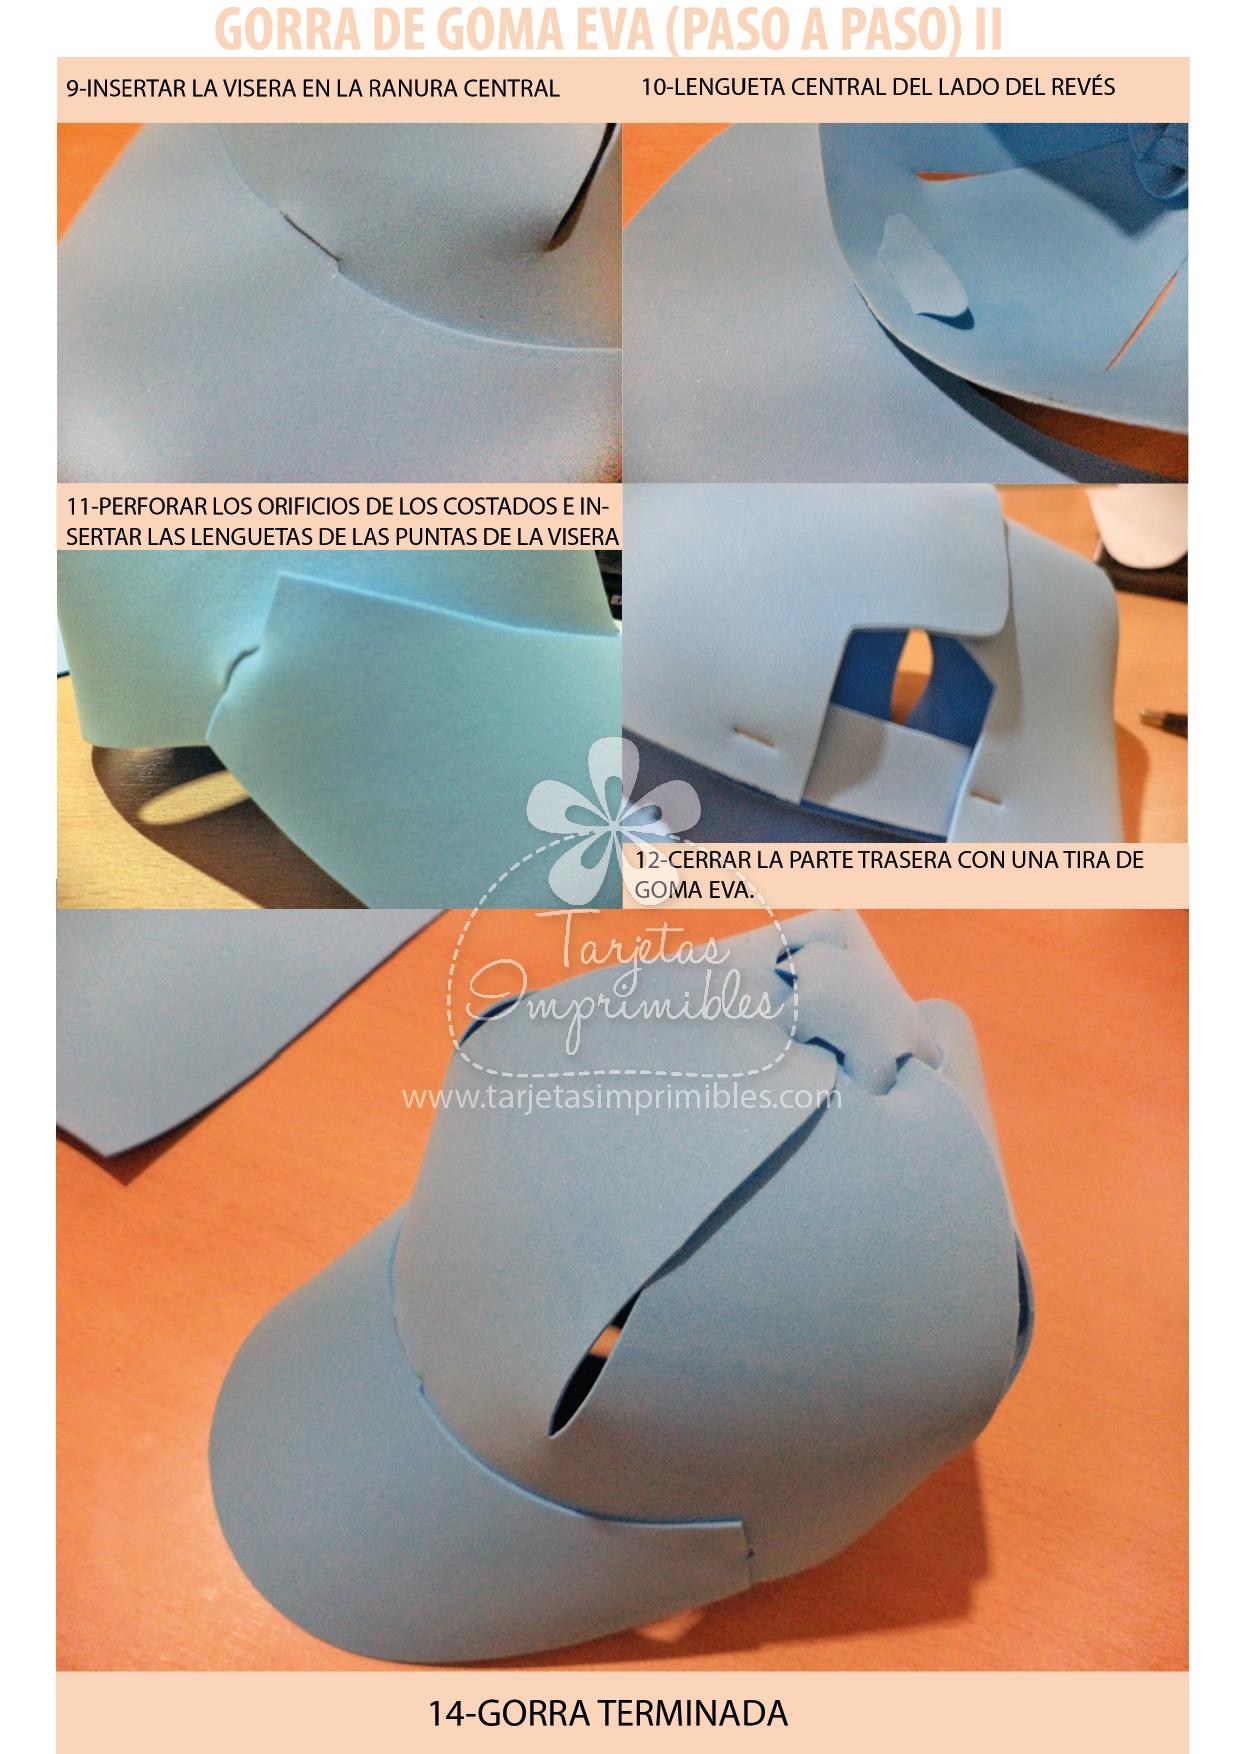 Pin de PaperQueenOrigami em gorros goma espuma  cotillón  21ae45fd38b